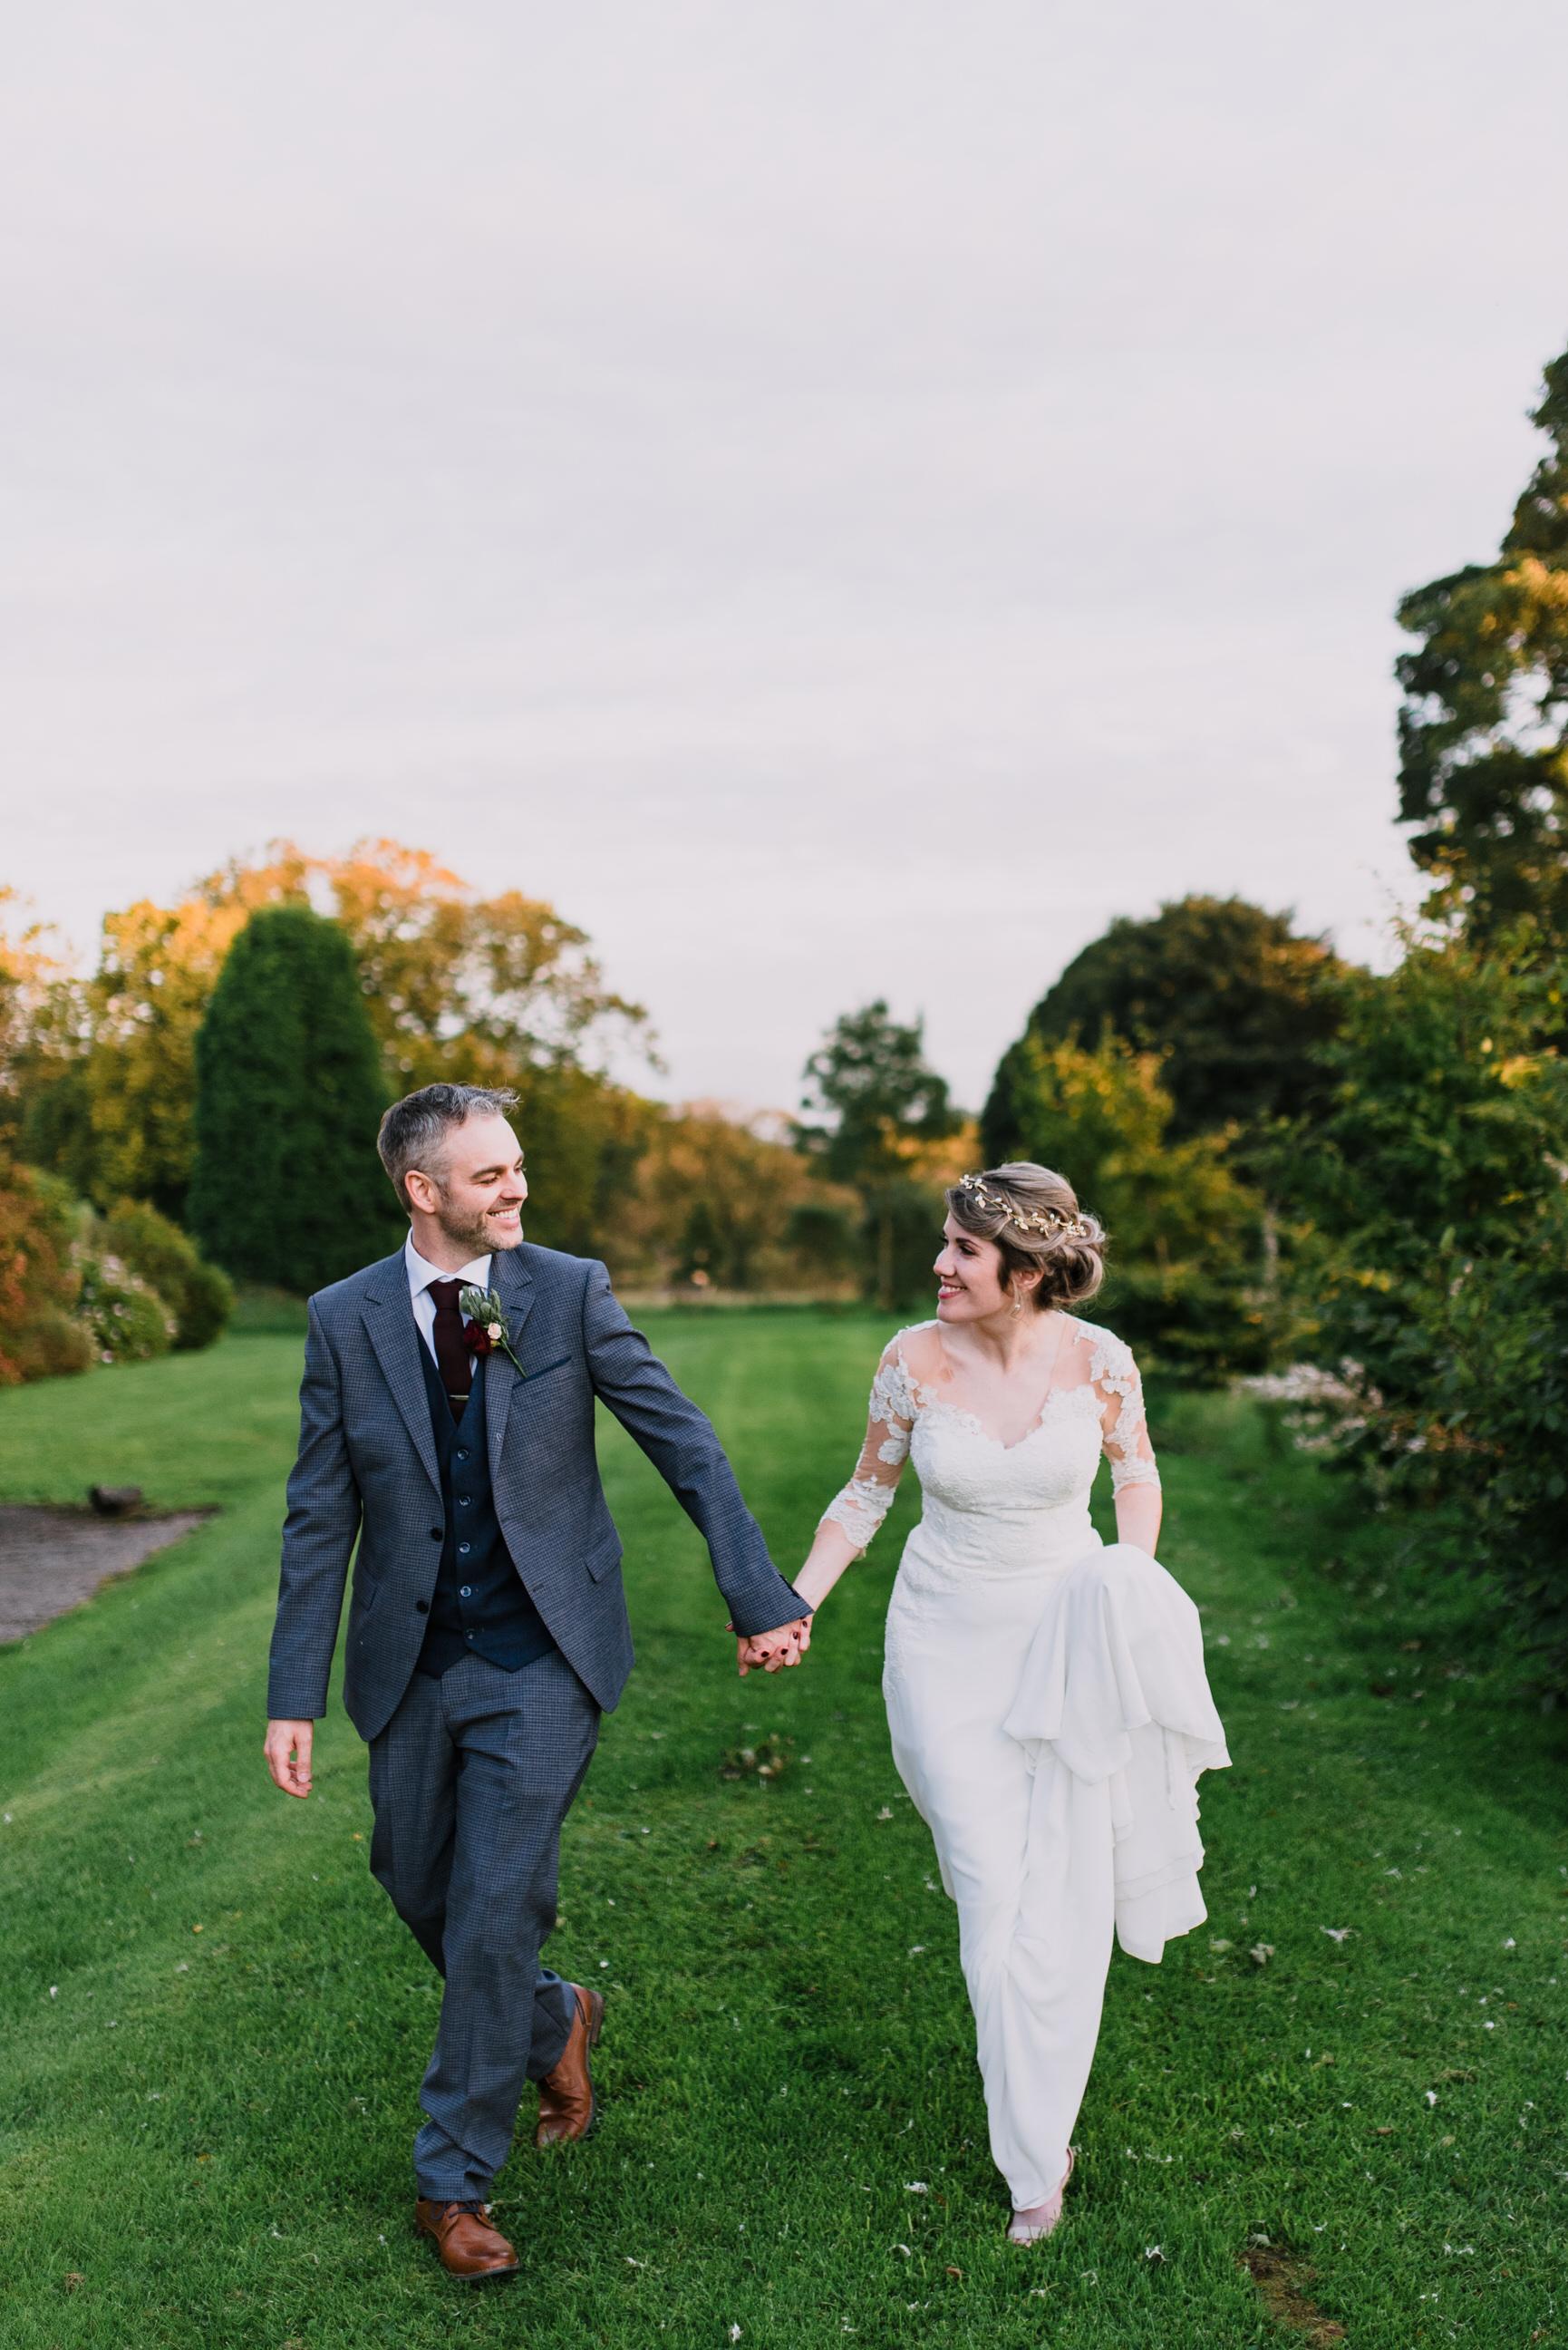 lissanoure castle wedding, northern ireland wedding photographer, romantic northern irish wedding venue, castle wedding ireland, natural wedding photography ni (125).jpg